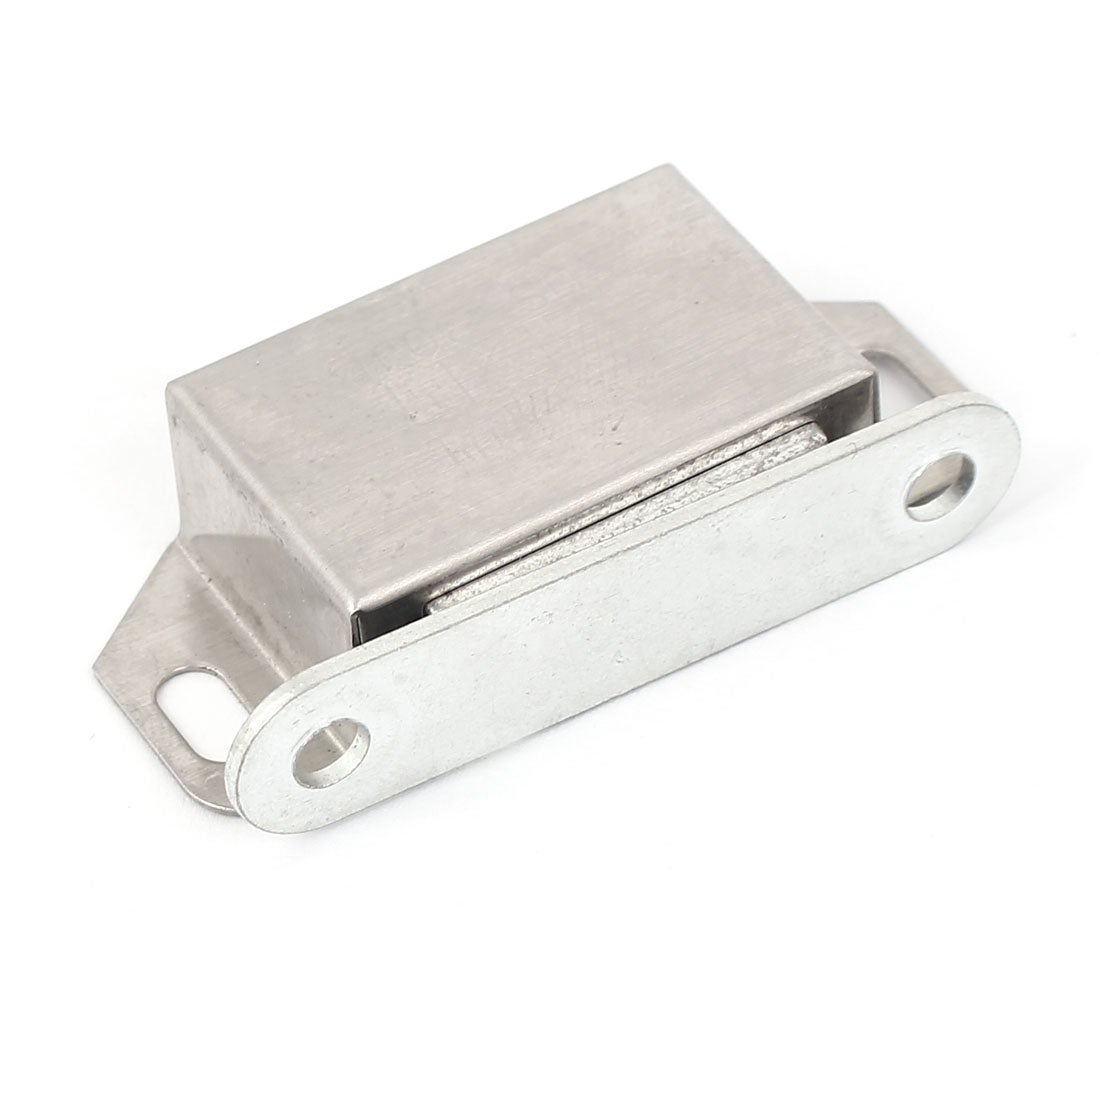 2 Pcs 55x25x13mm Single Magnetic Latch Catch For Cupboard Closet Cabinet Door